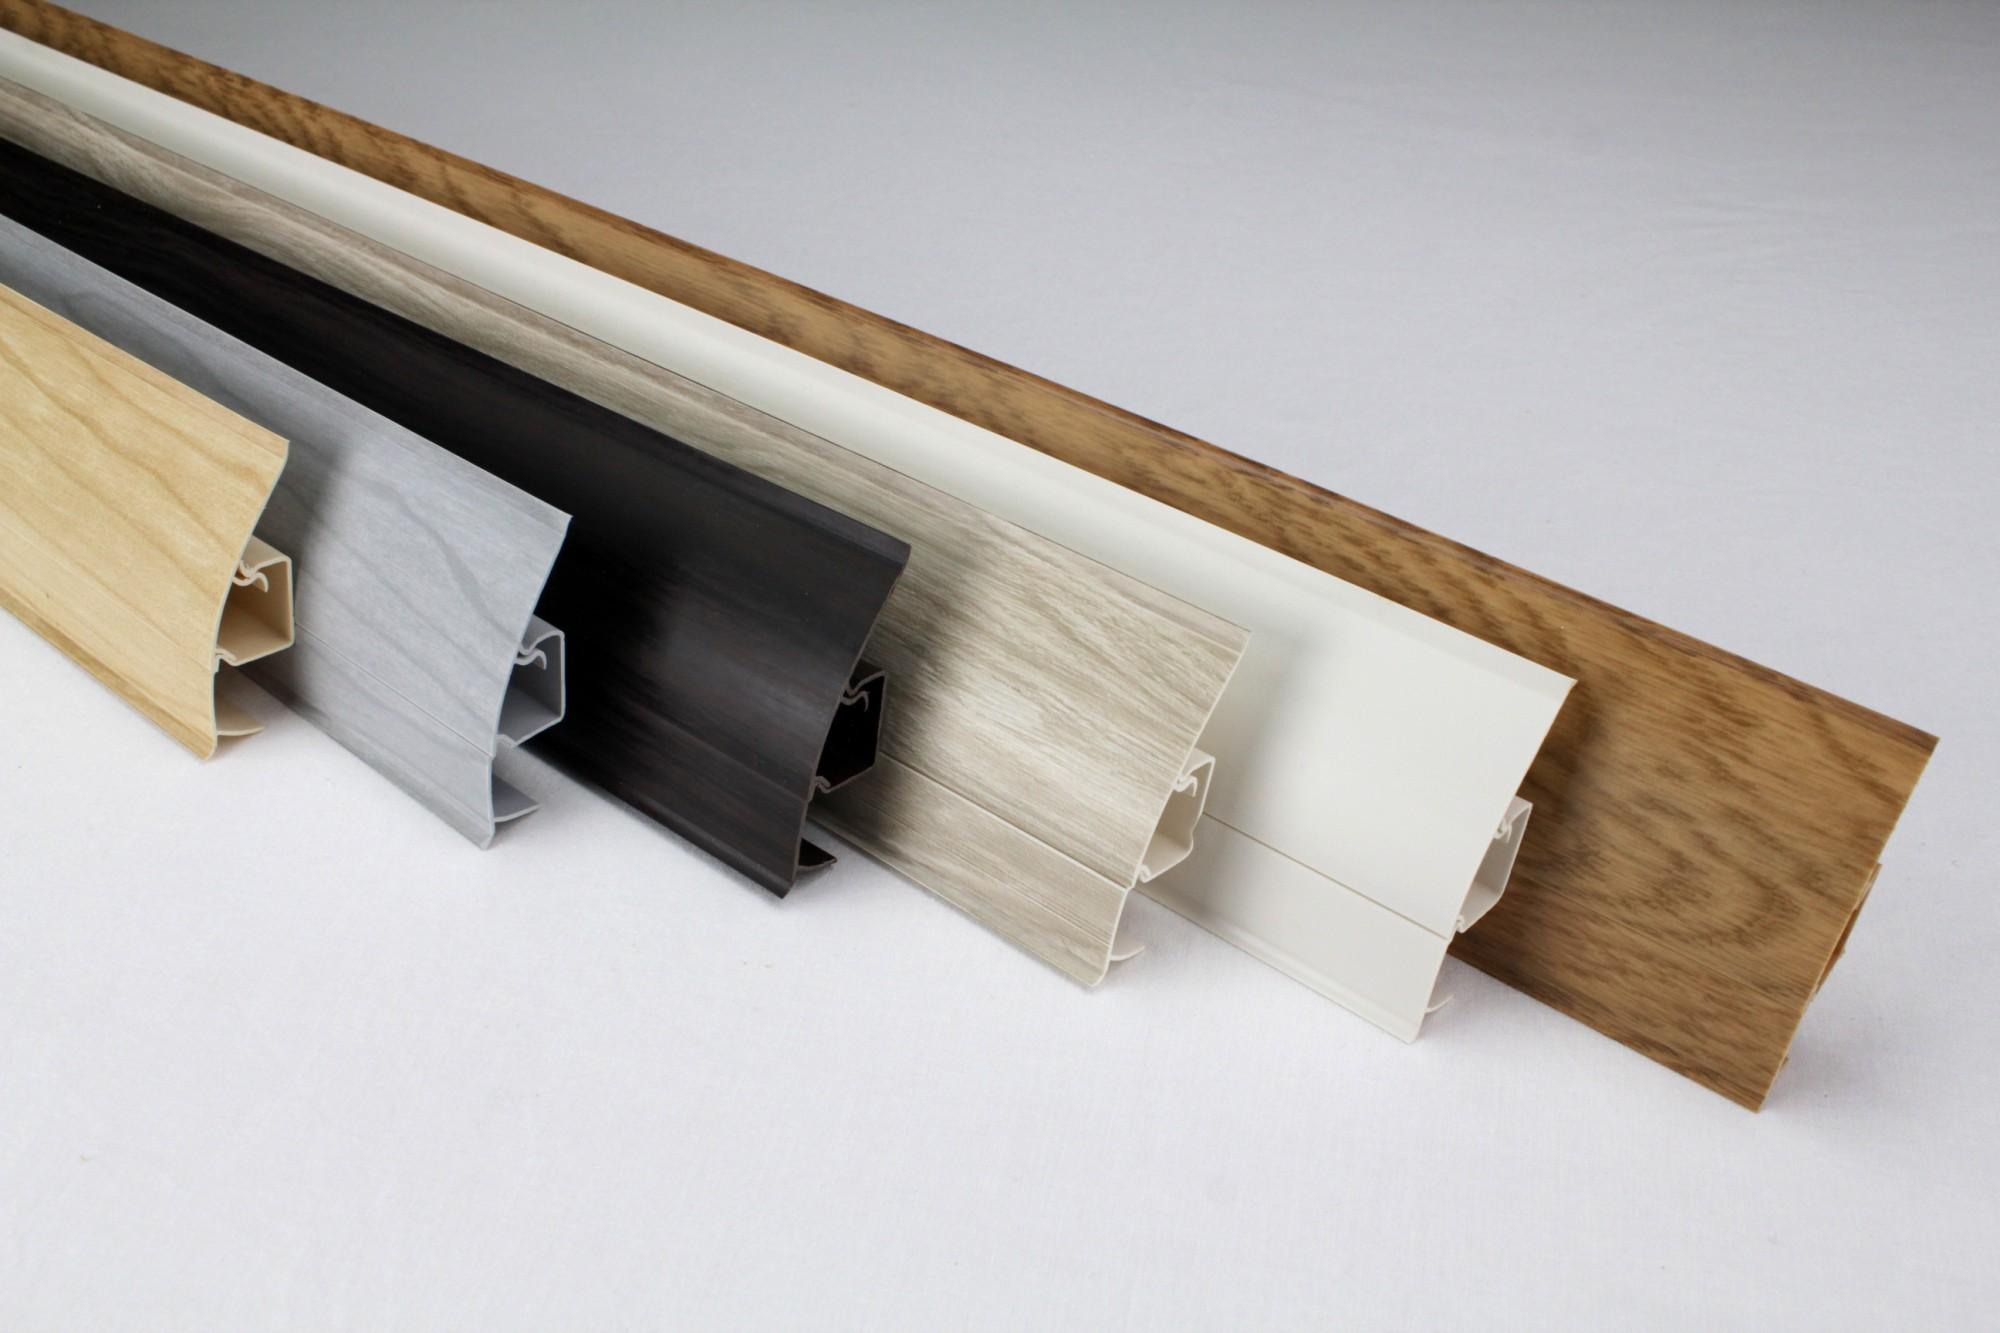 muster musterst cke sockel fu leisten sockelleisten modern. Black Bedroom Furniture Sets. Home Design Ideas